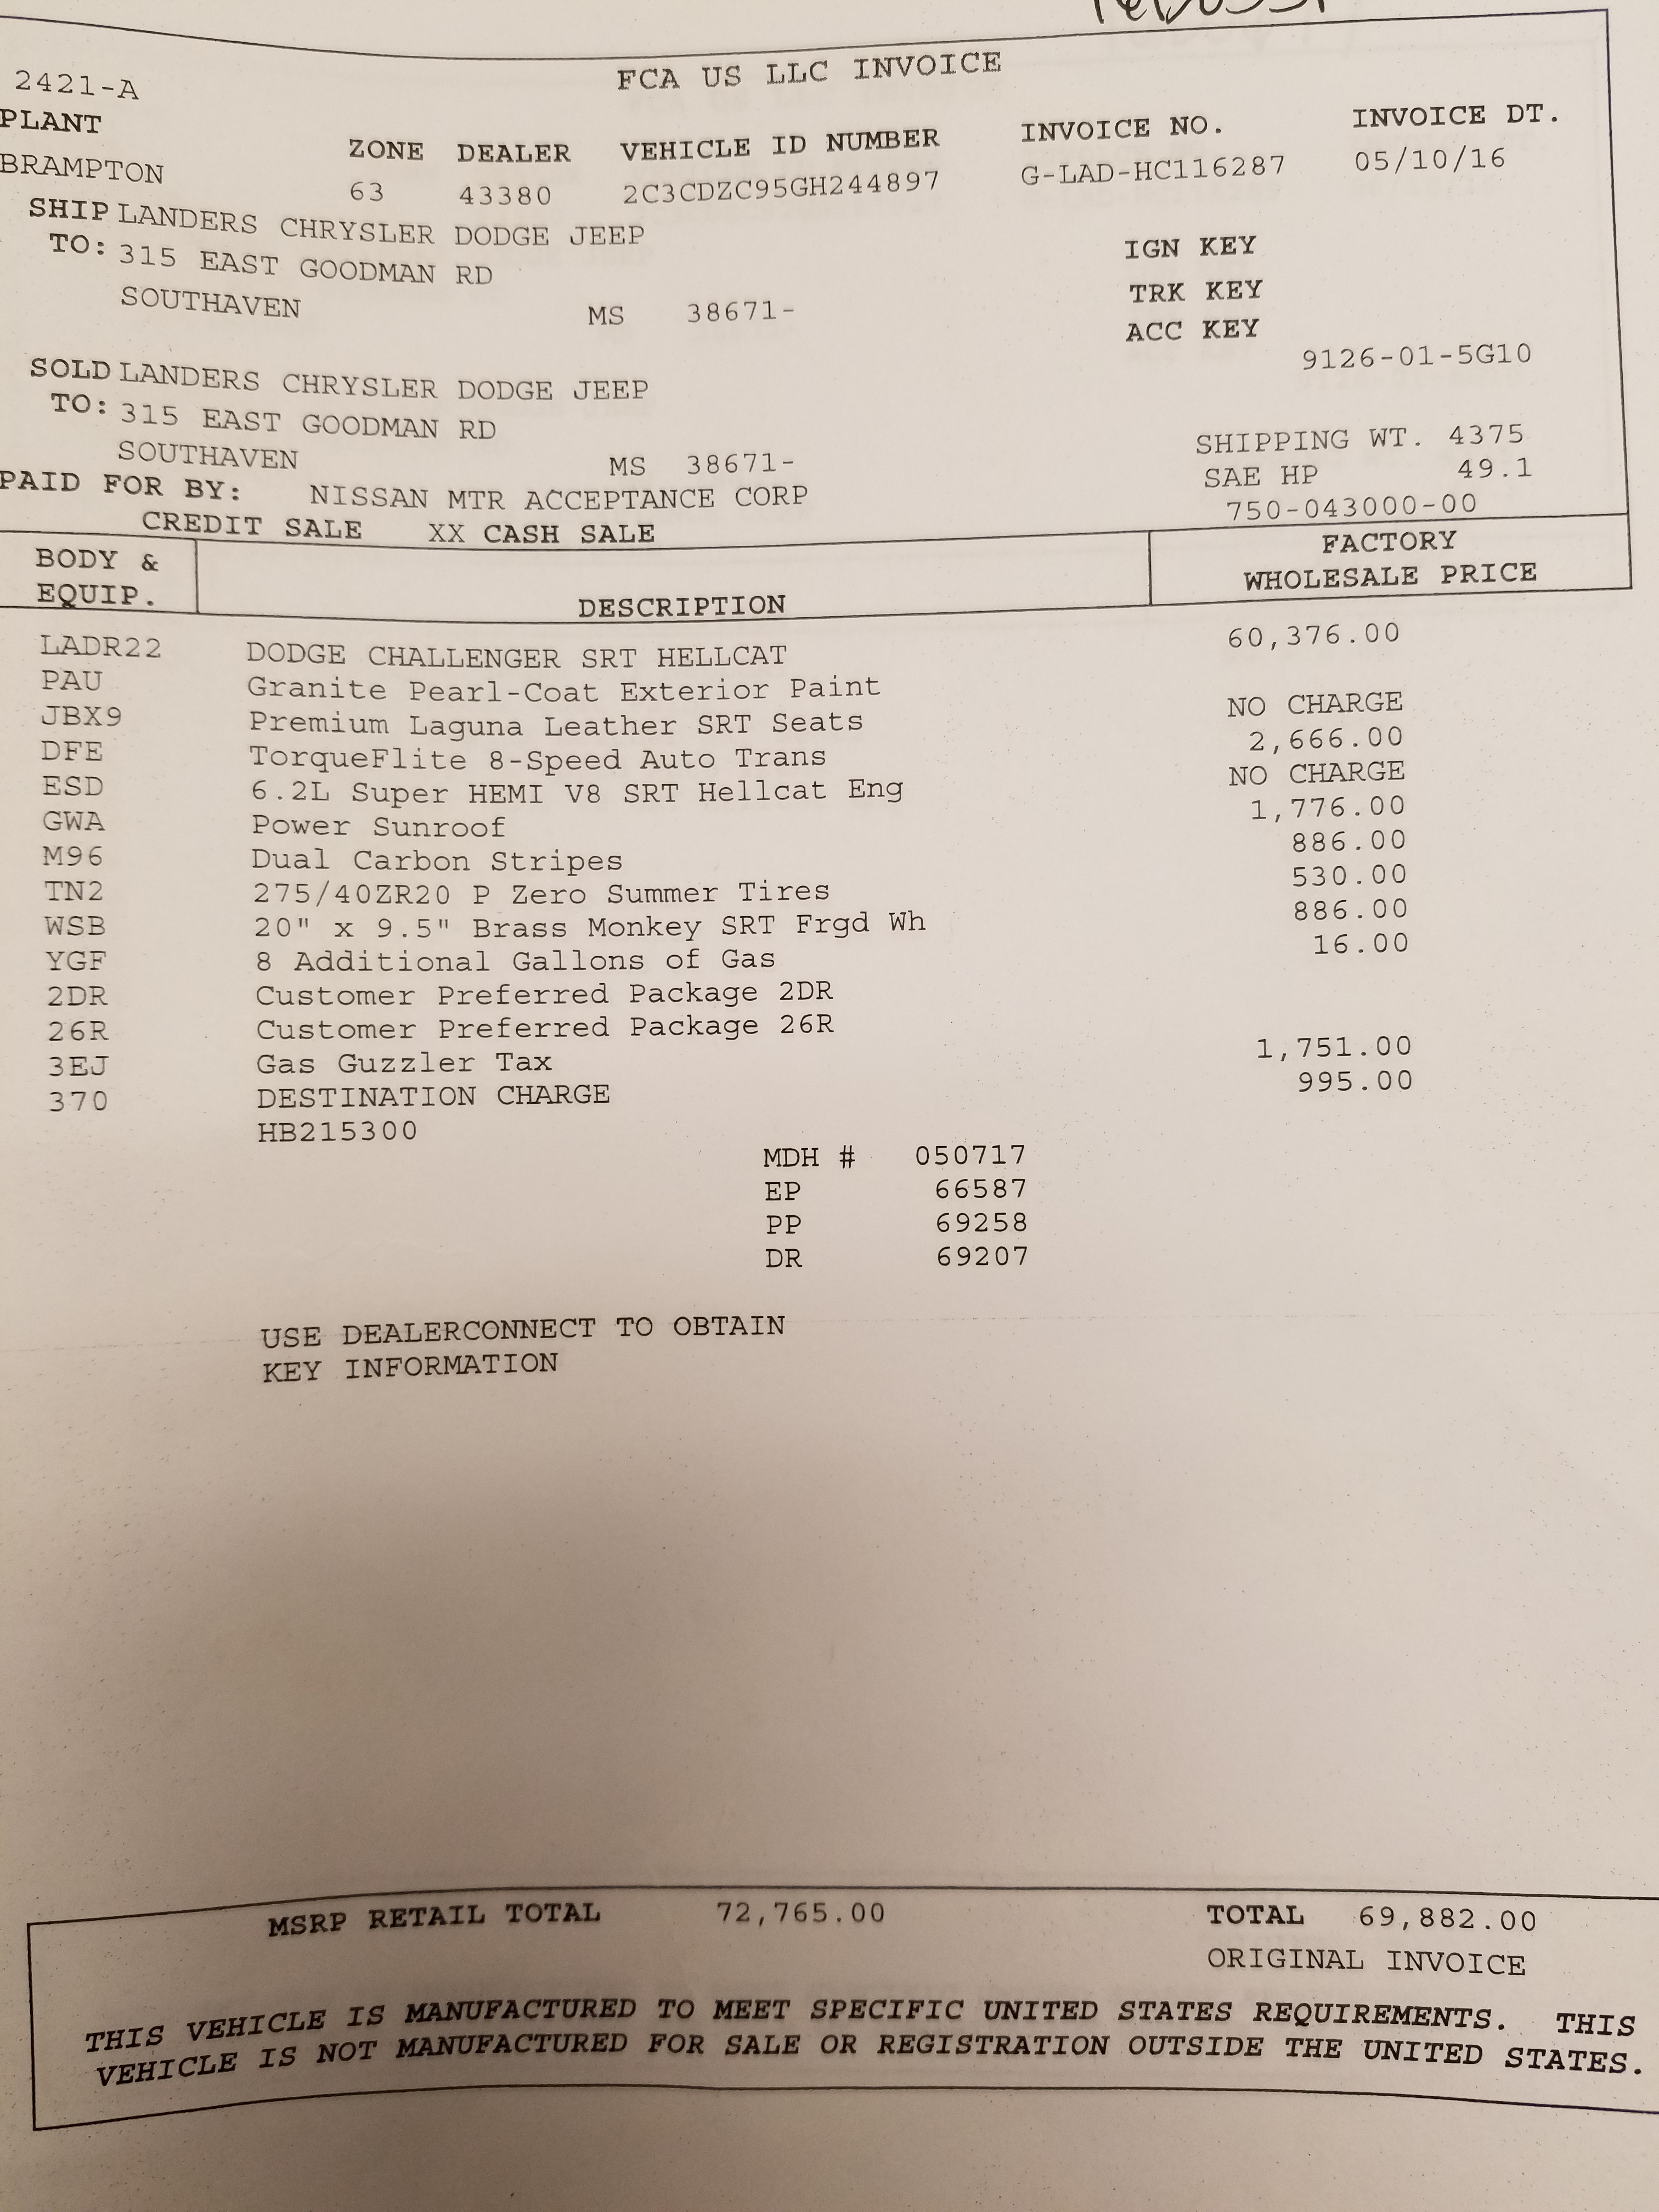 Brand New Hellcats Invoice Pricing SRT Hellcat Forum - Dodge challenger invoice price